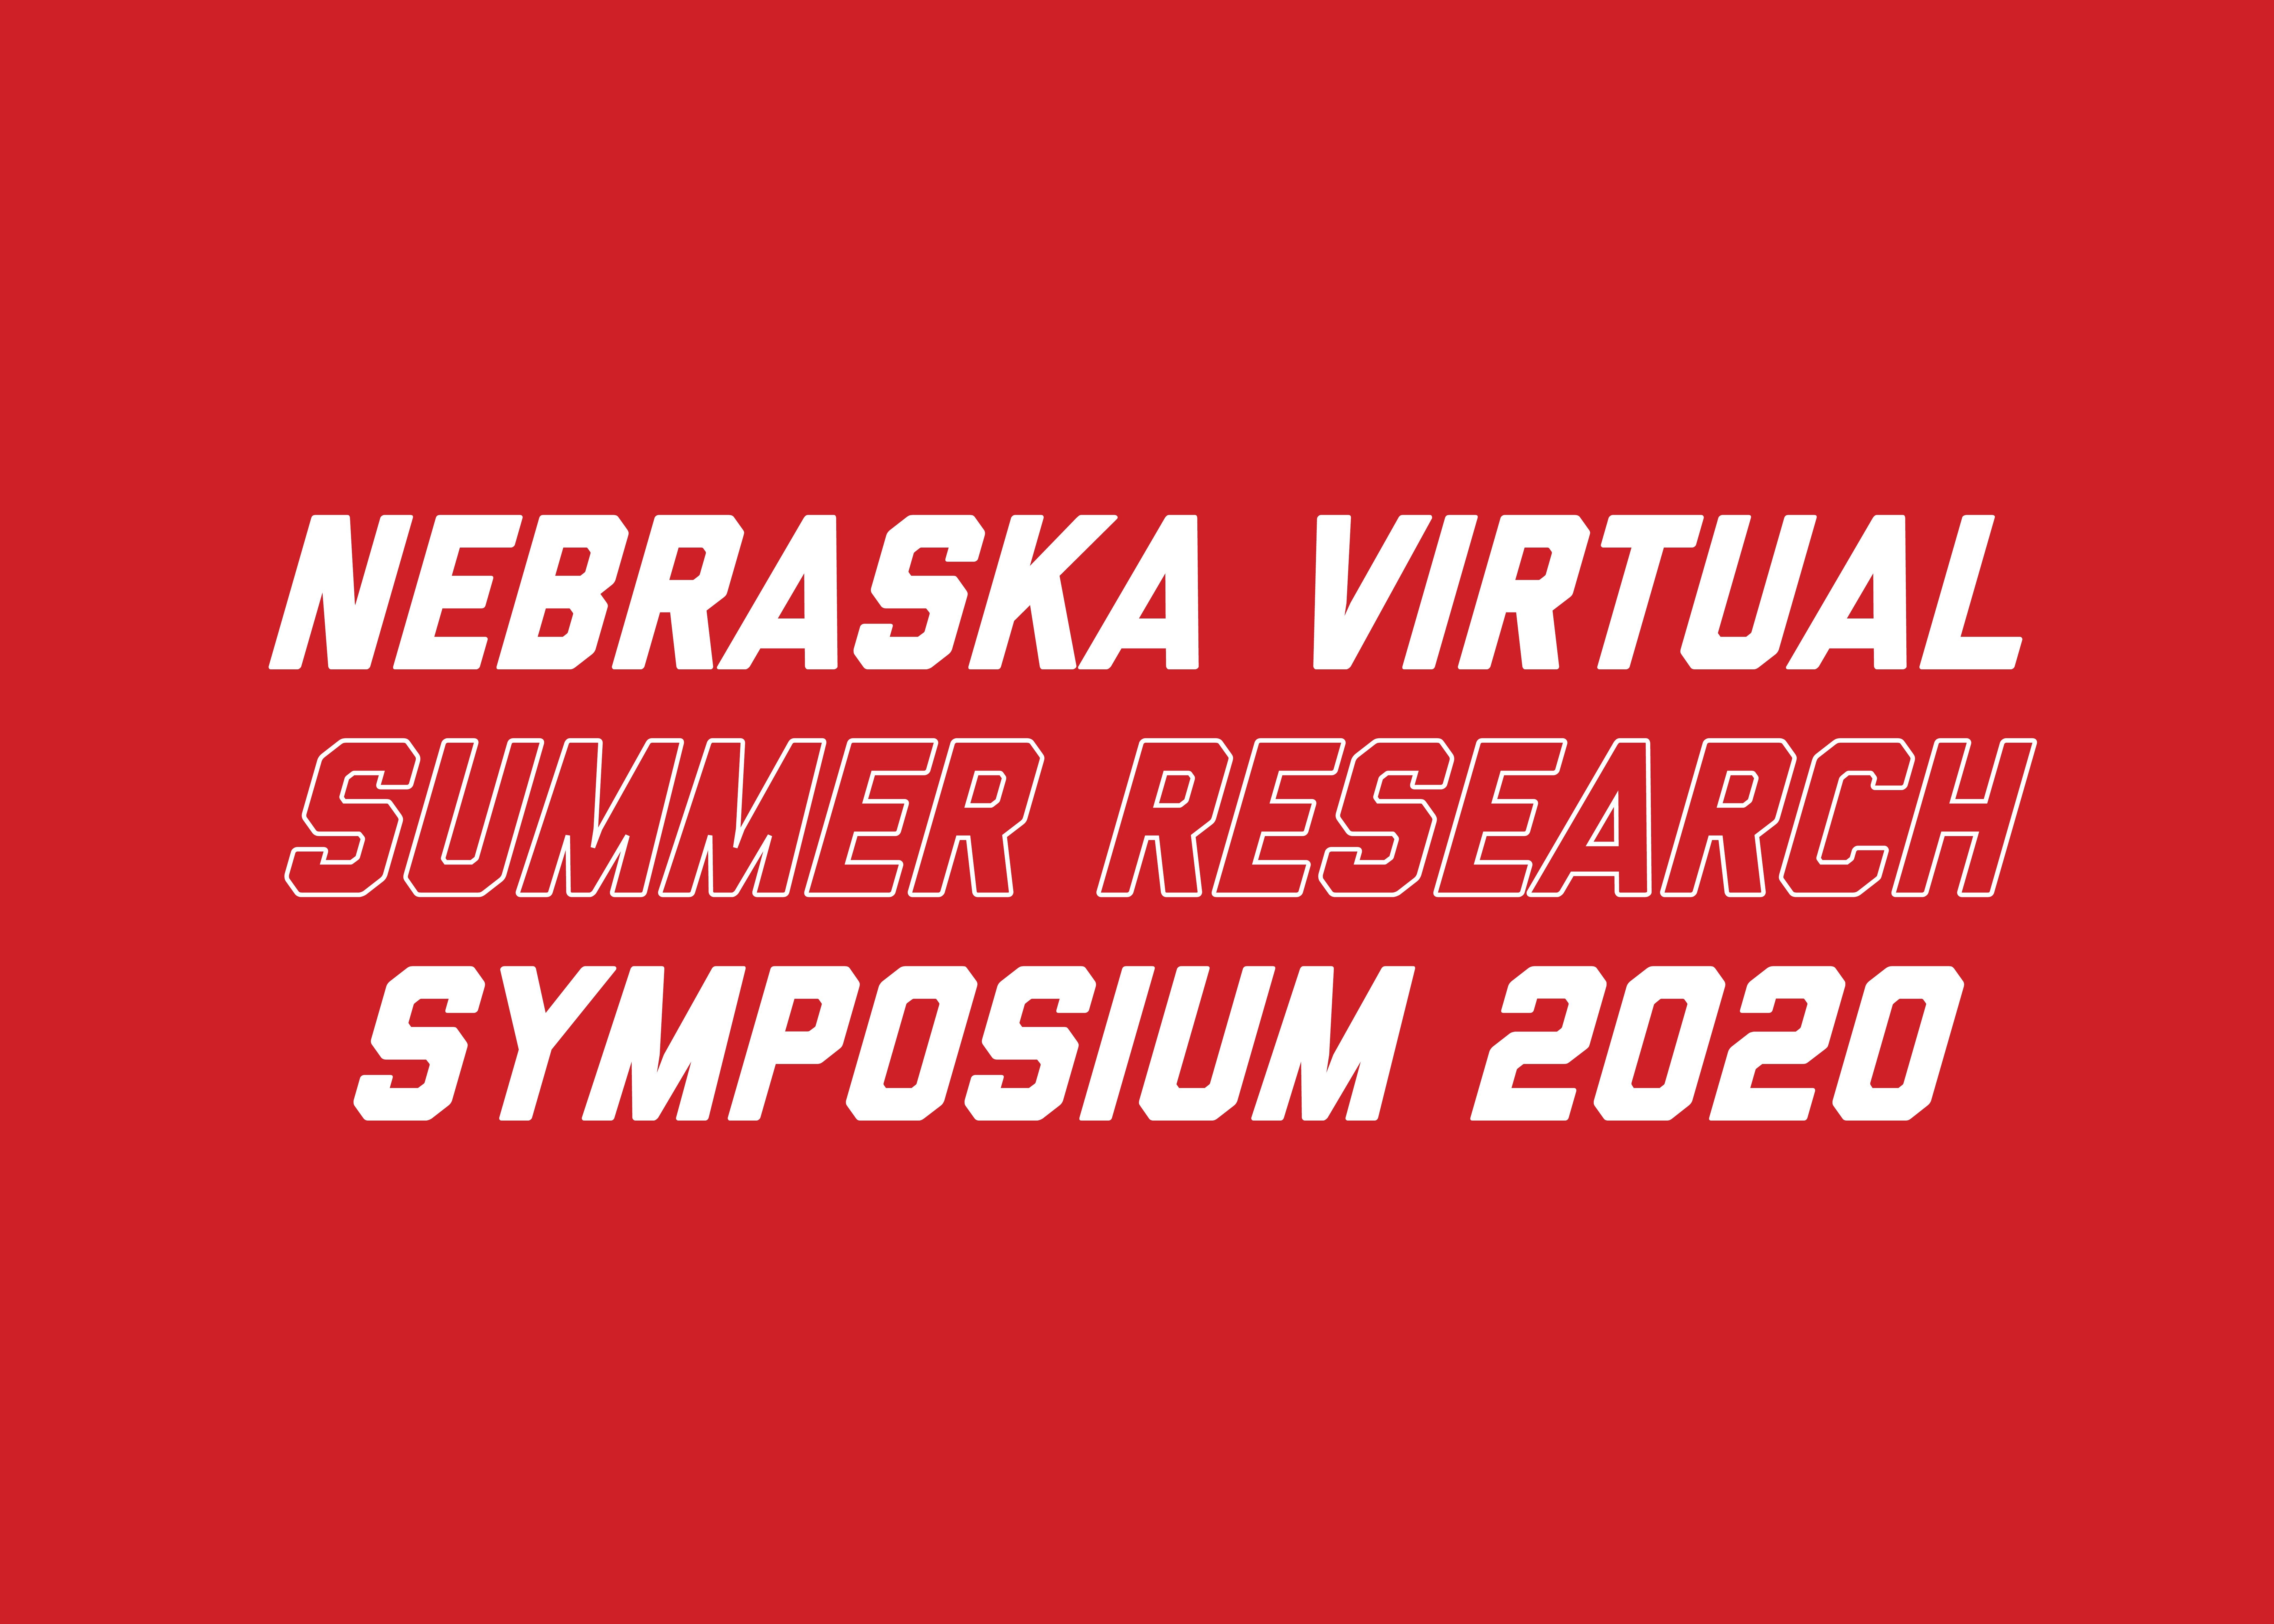 Nebraska Virtual Summer Research Symposium 2020